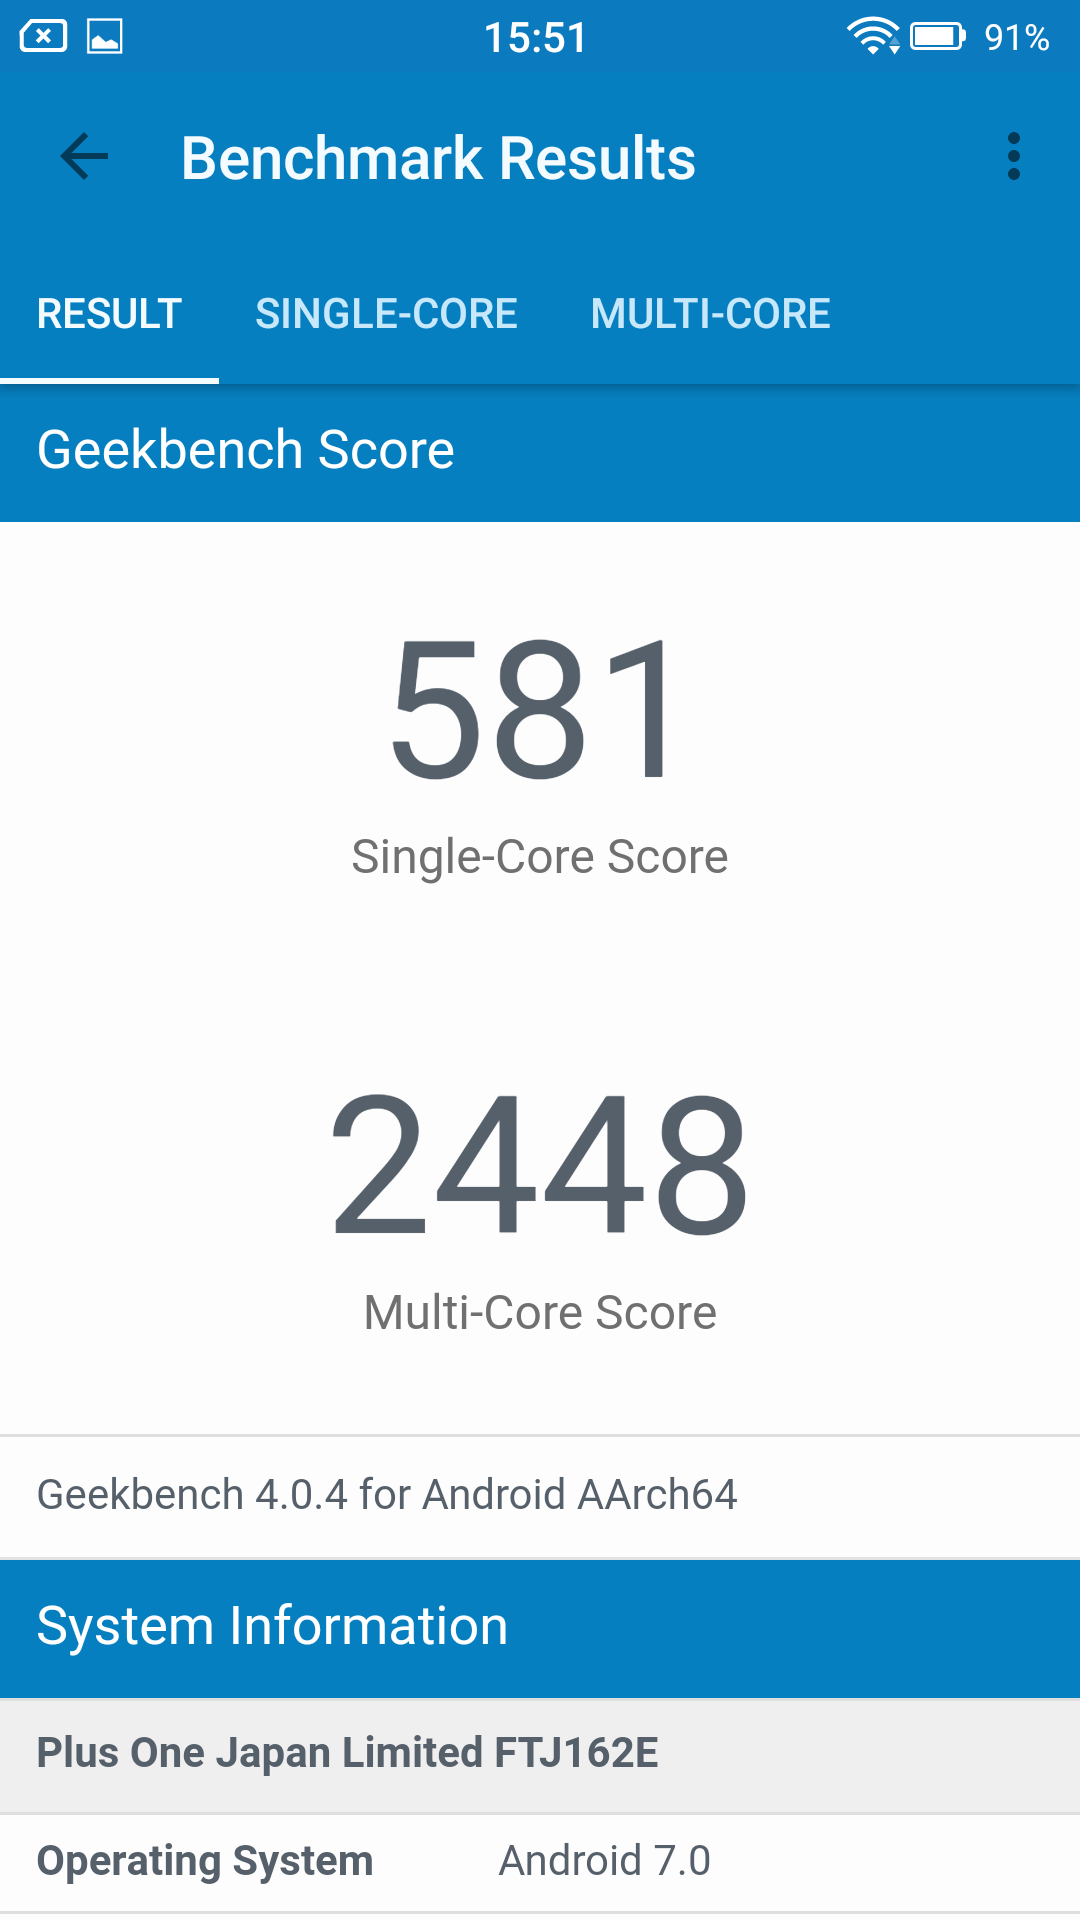 FREETEL RAIJIN Geekbench 581